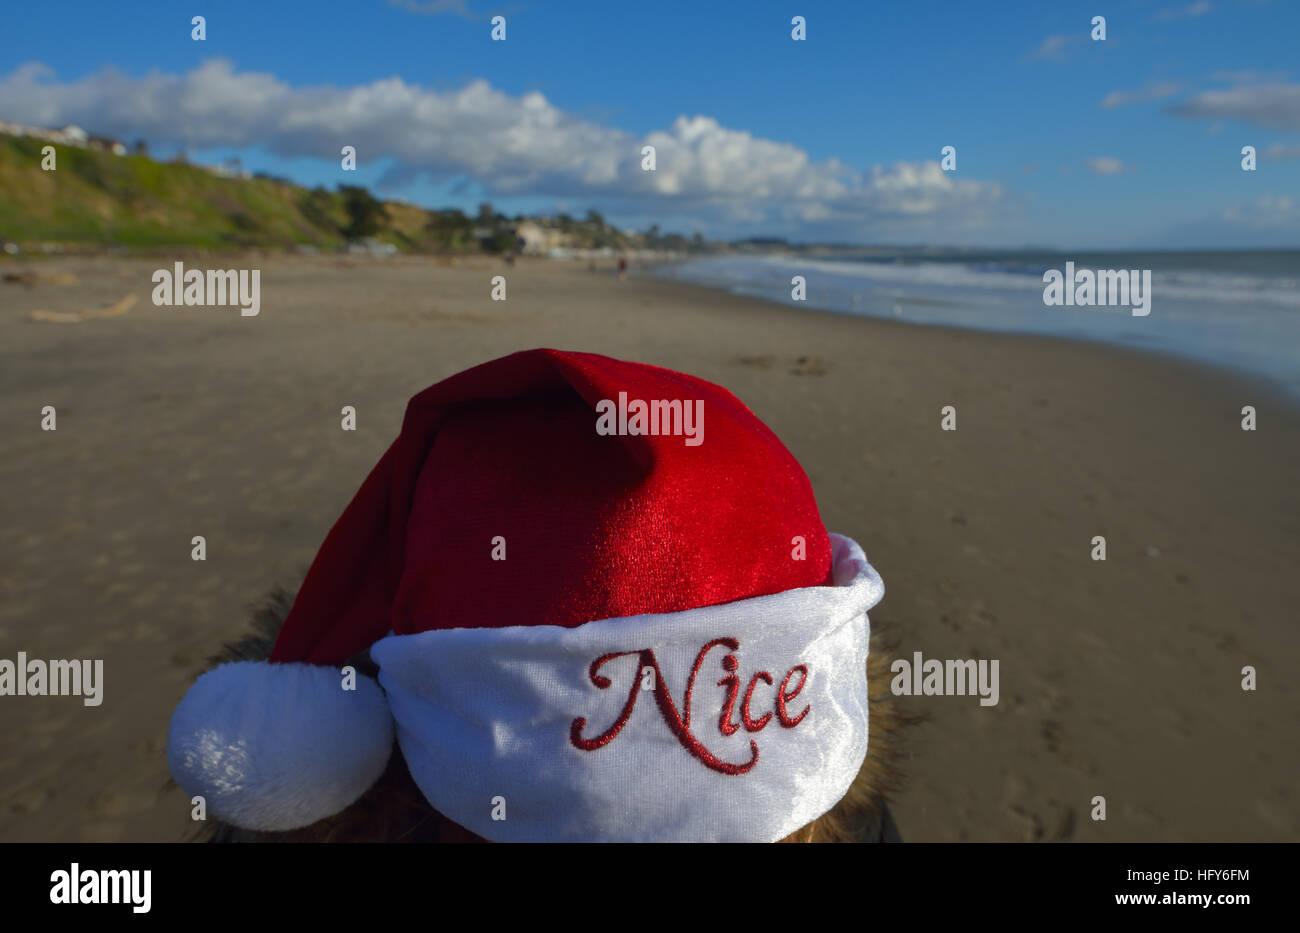 Nice Santa Claus at Christmas on the Seacliff state beach, Aptos CA - Stock Image